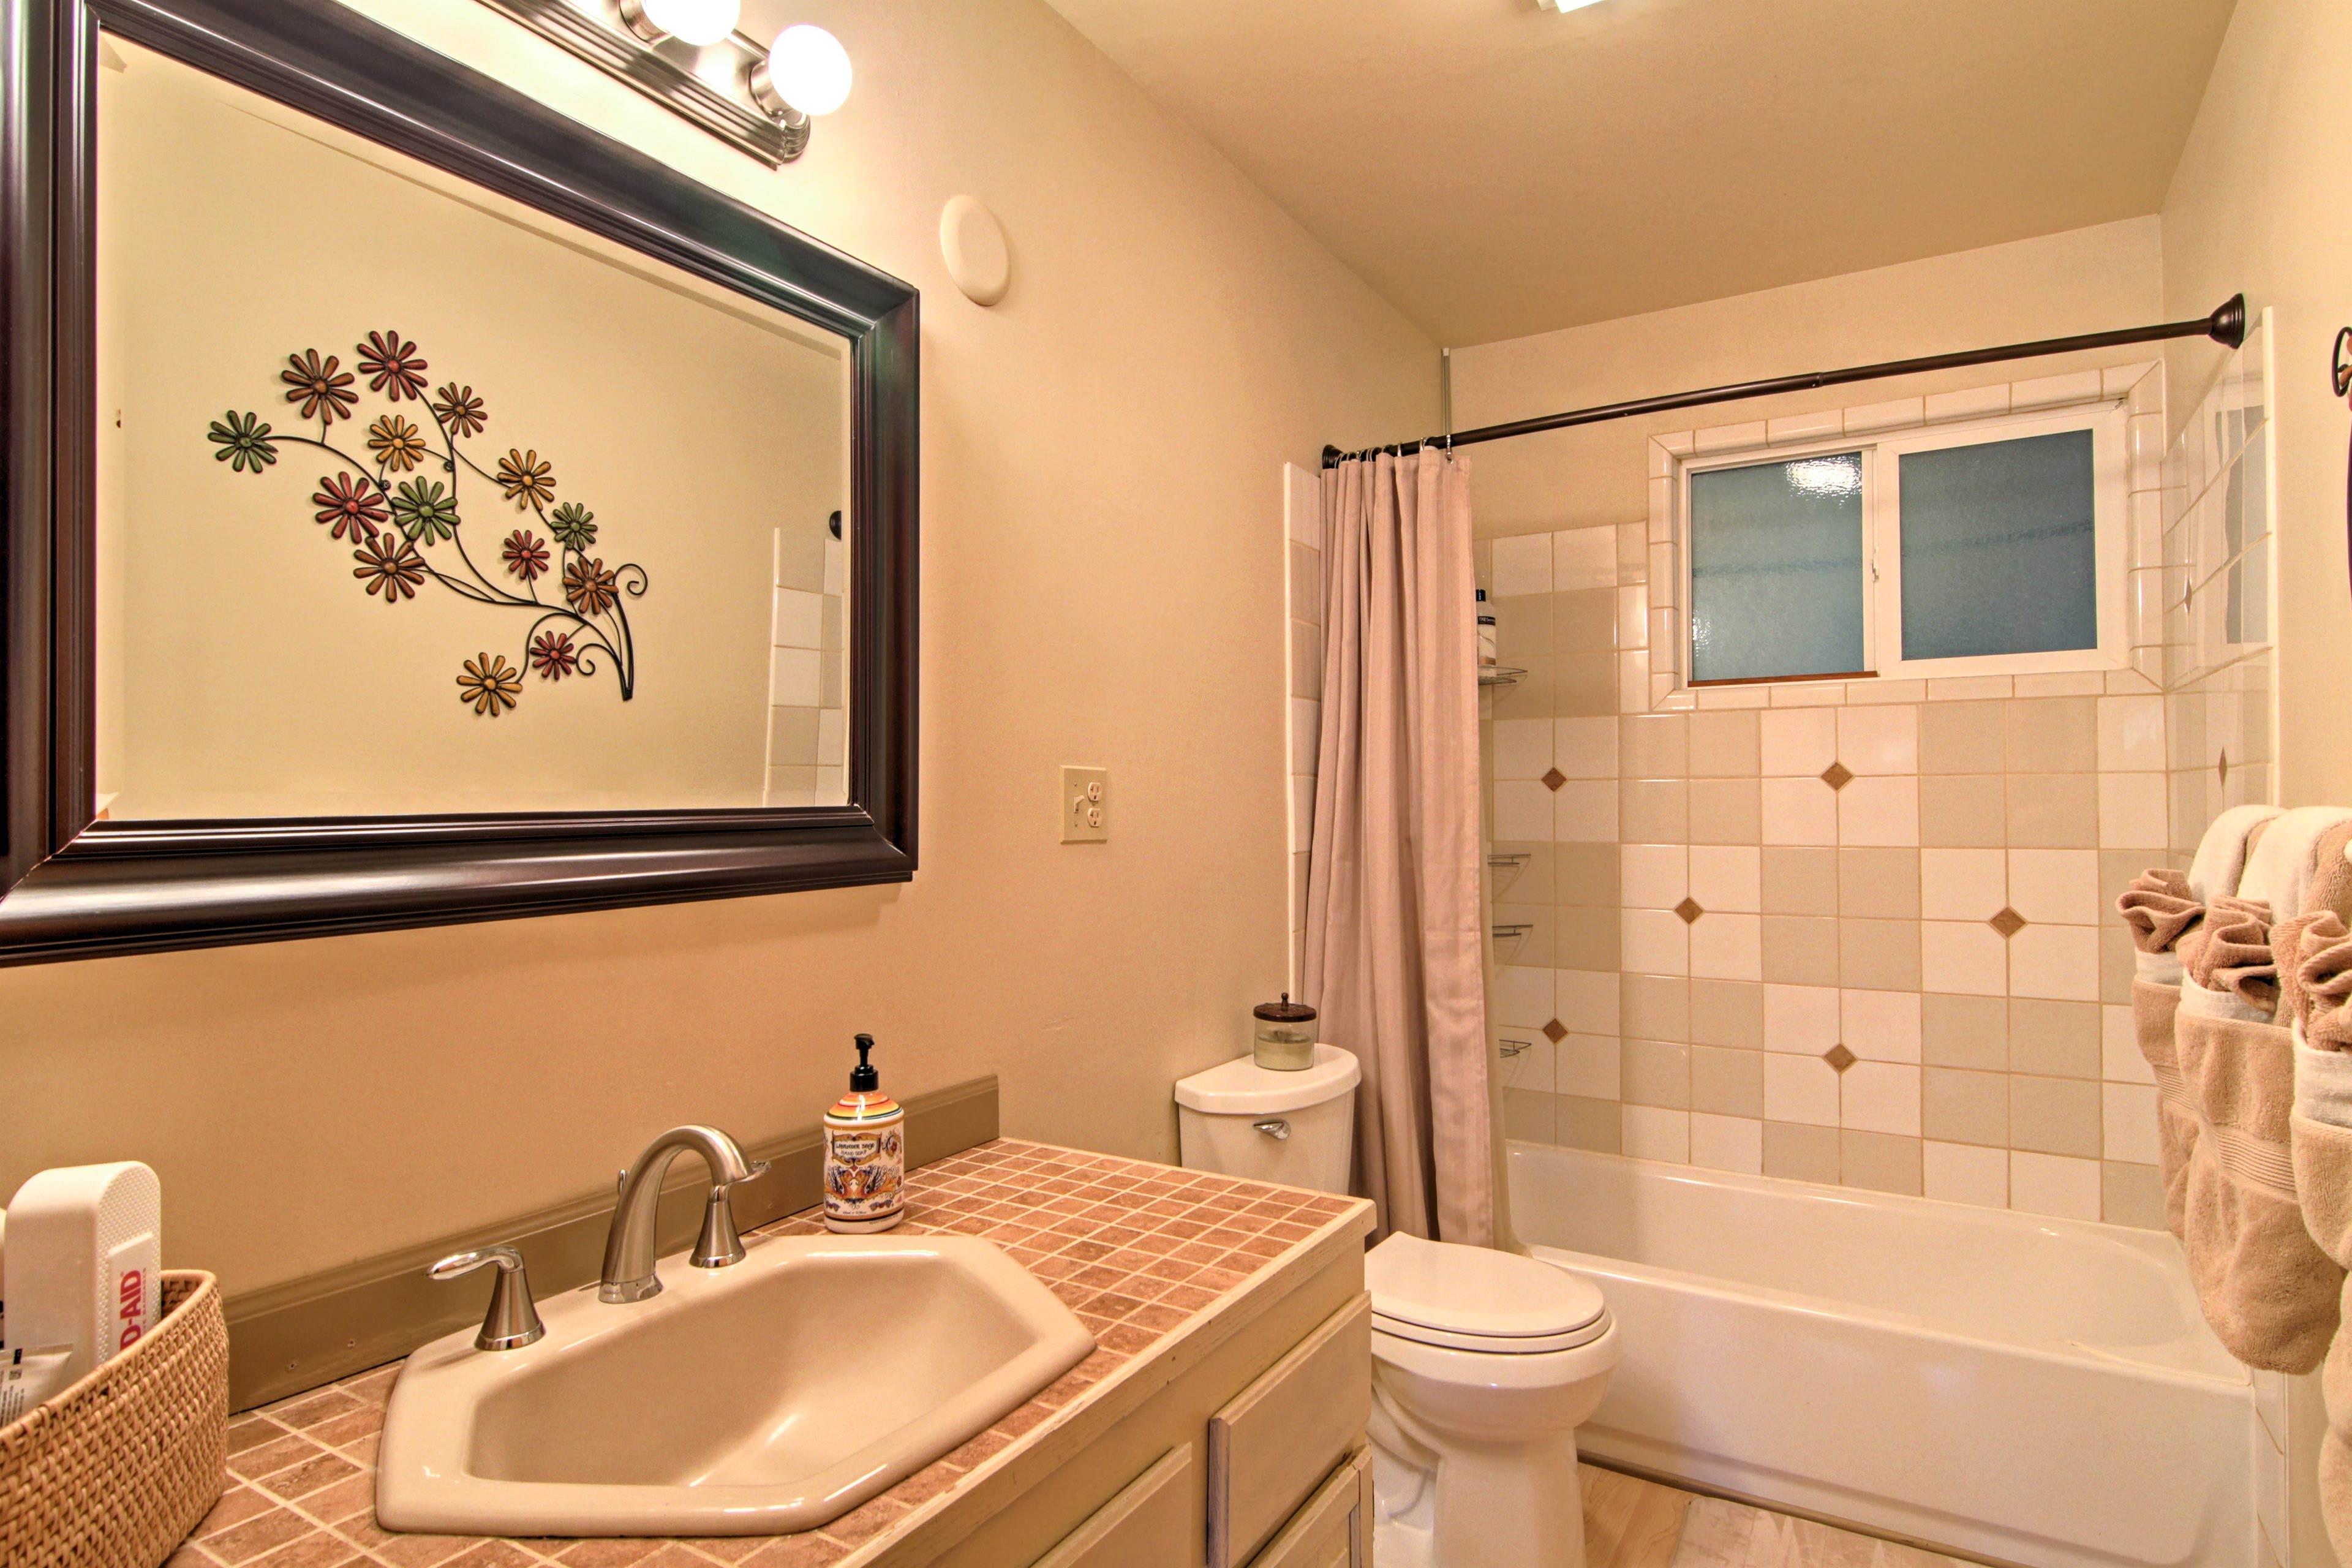 Take a bath or shower in the cute bathroom.